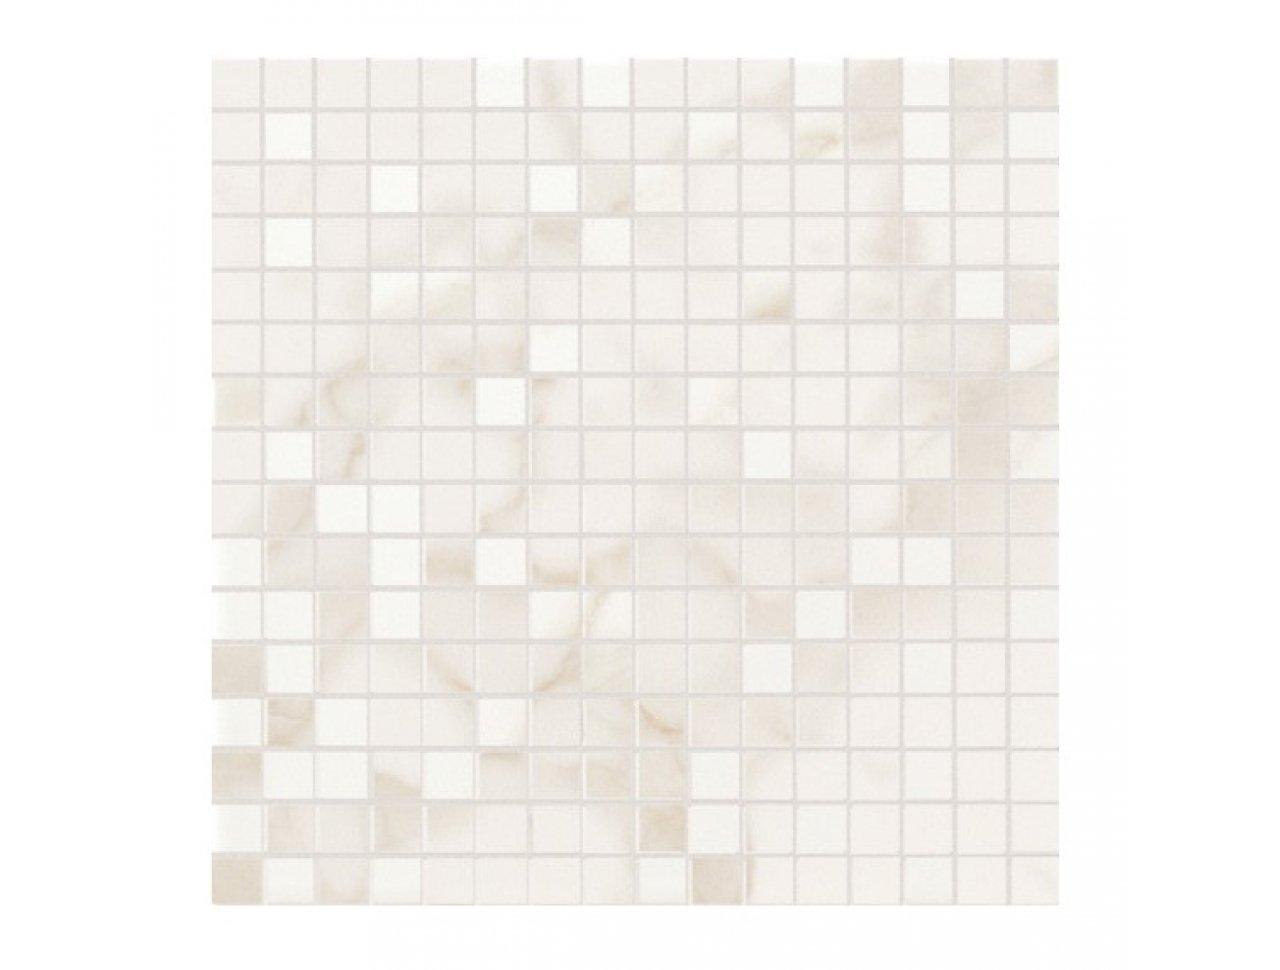 Мозаика FAP Roma Diamond Calacatta Mosaico 30.5 x 30.5 см, Арт. fNH0